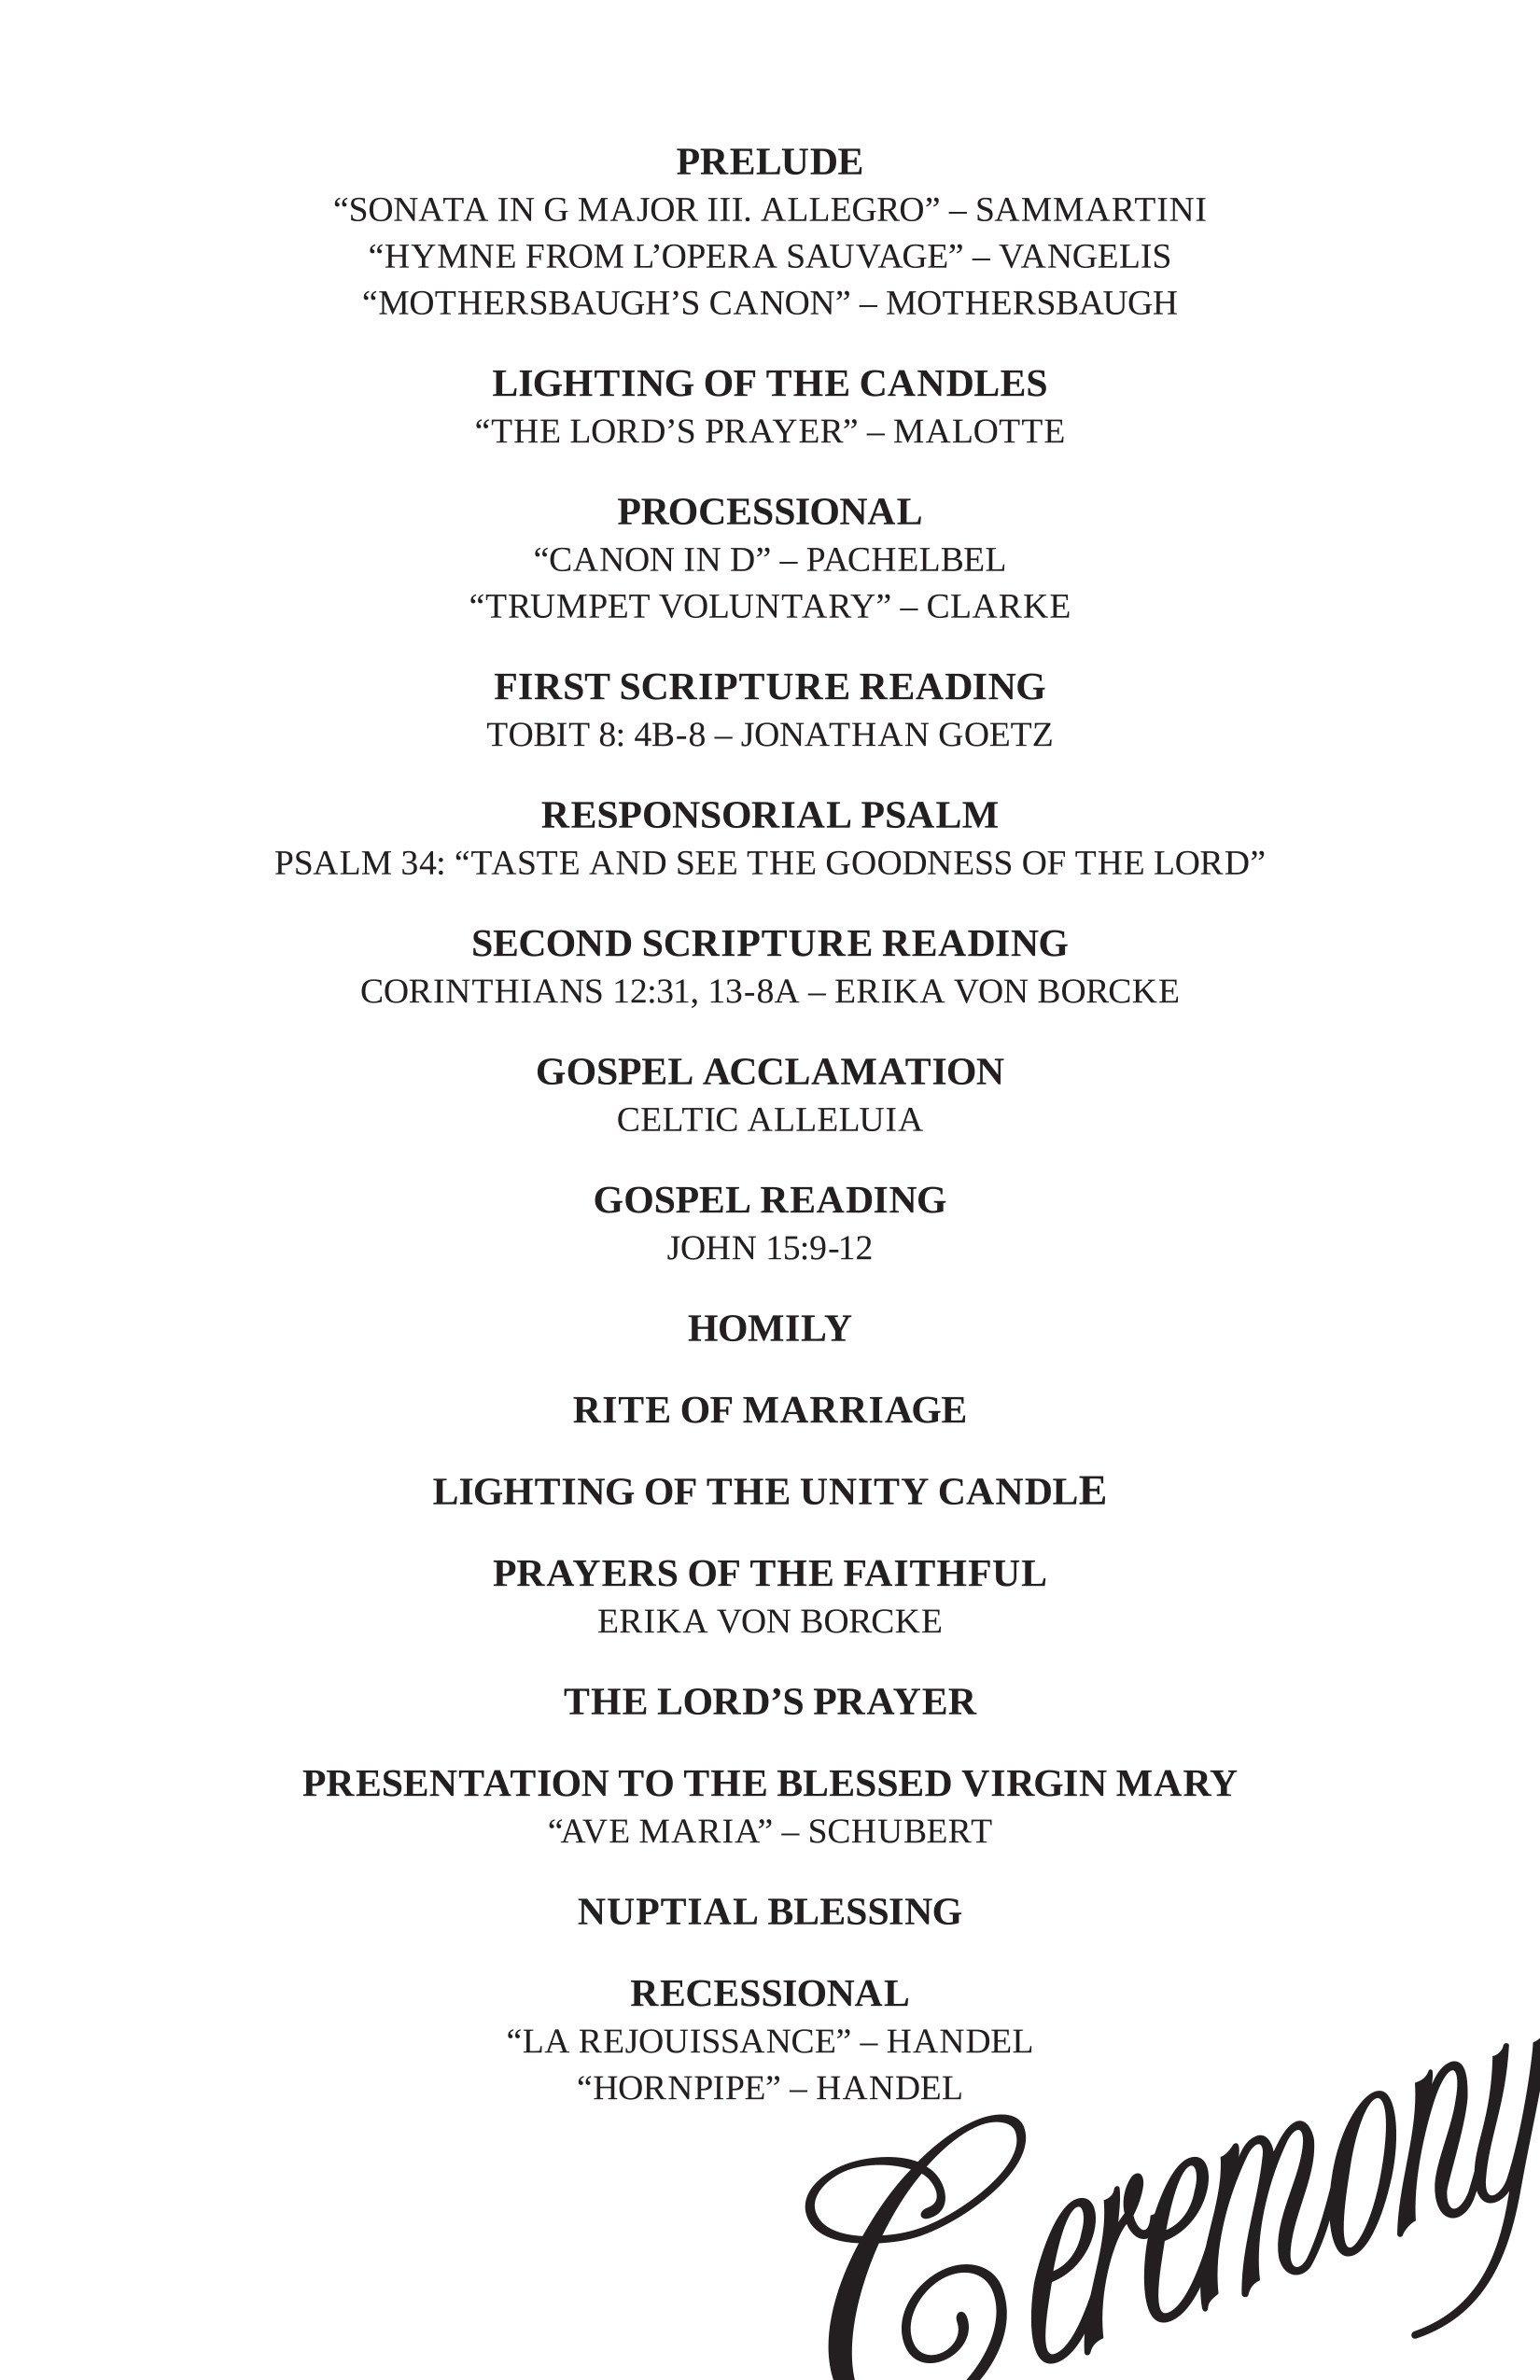 Wedding Reception Programme Template Wedding Reception Program Ideas Wedding Decor Ideas